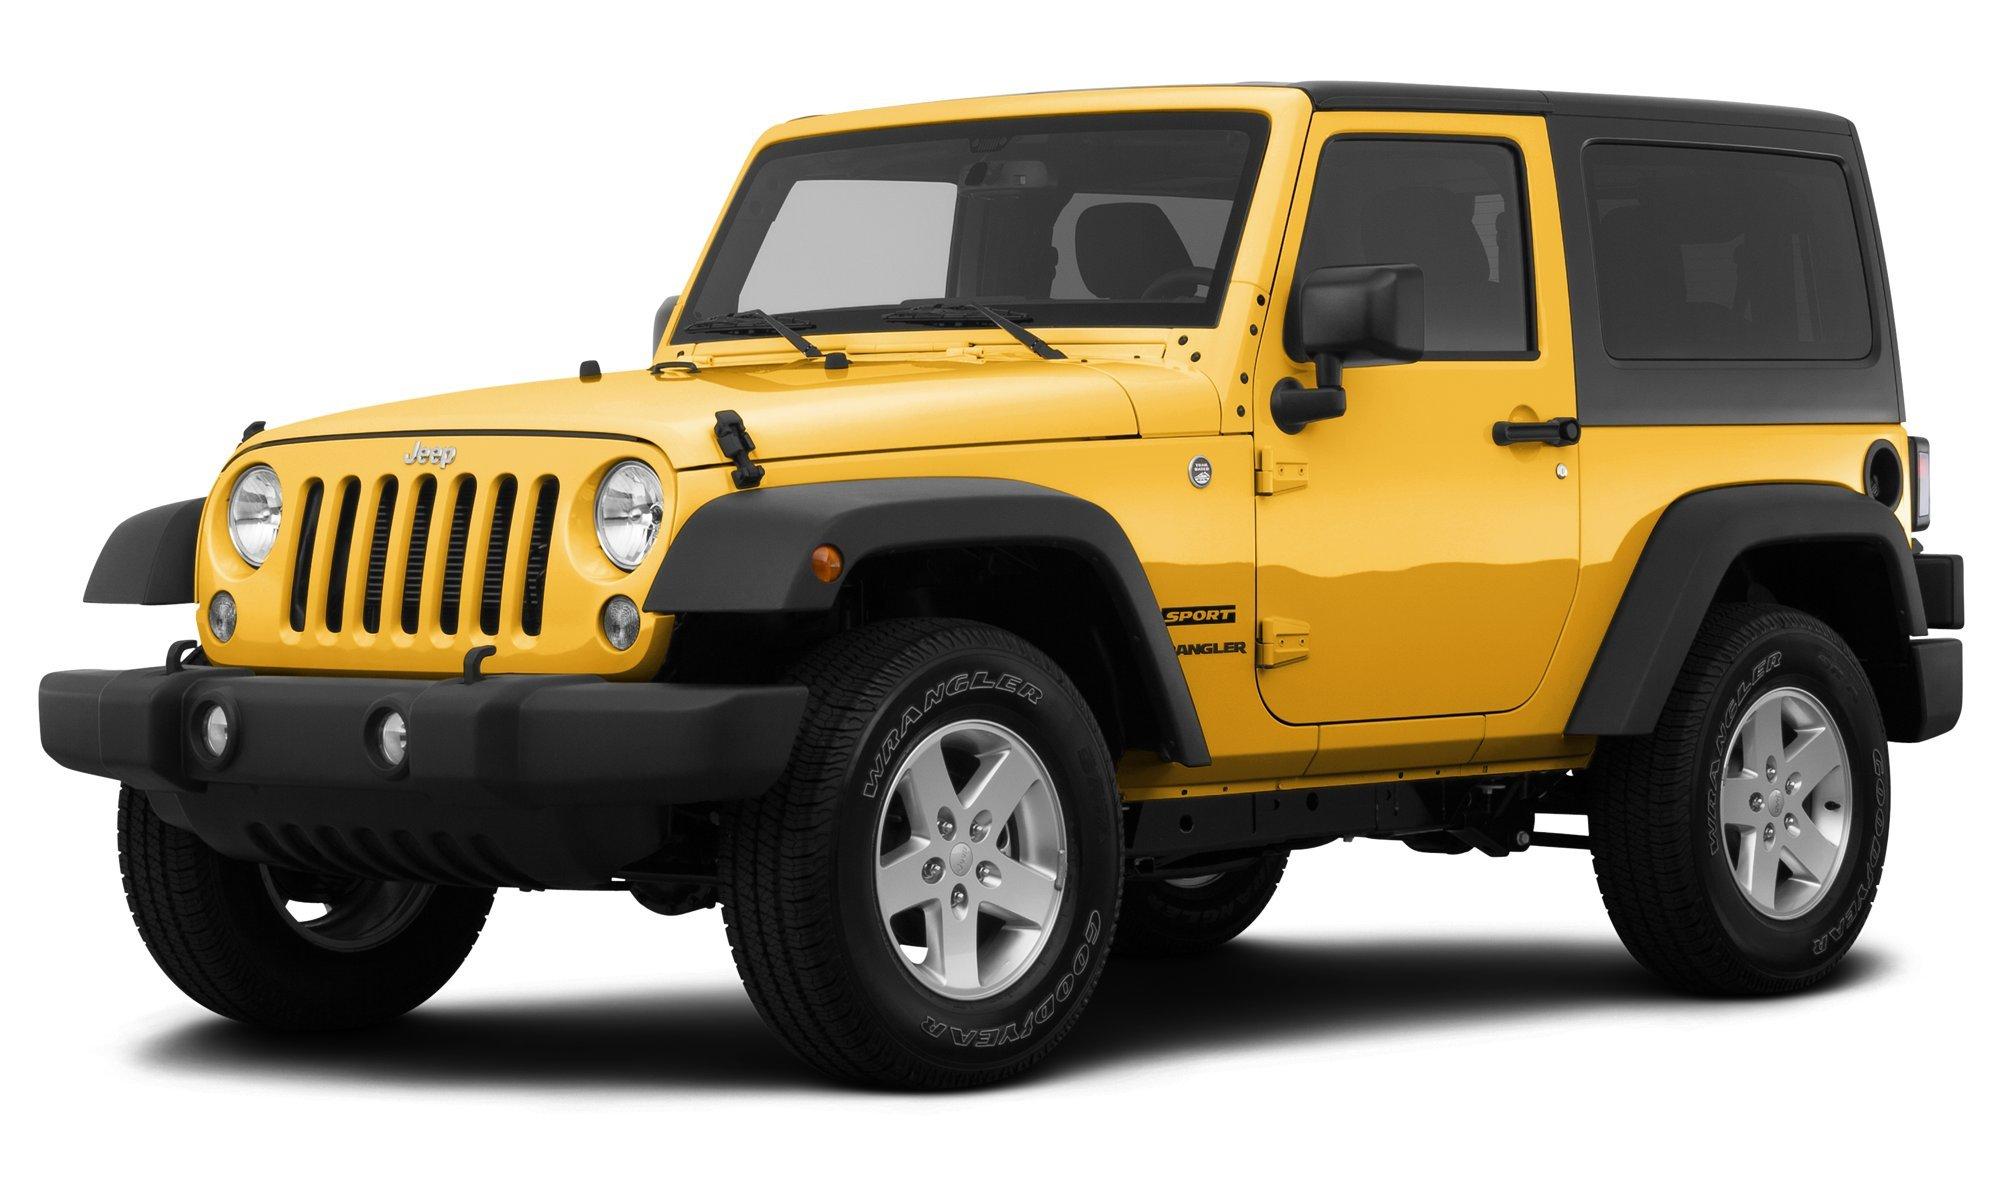 Amazon 2015 Jeep Wrangler Reviews and Specs Vehicles